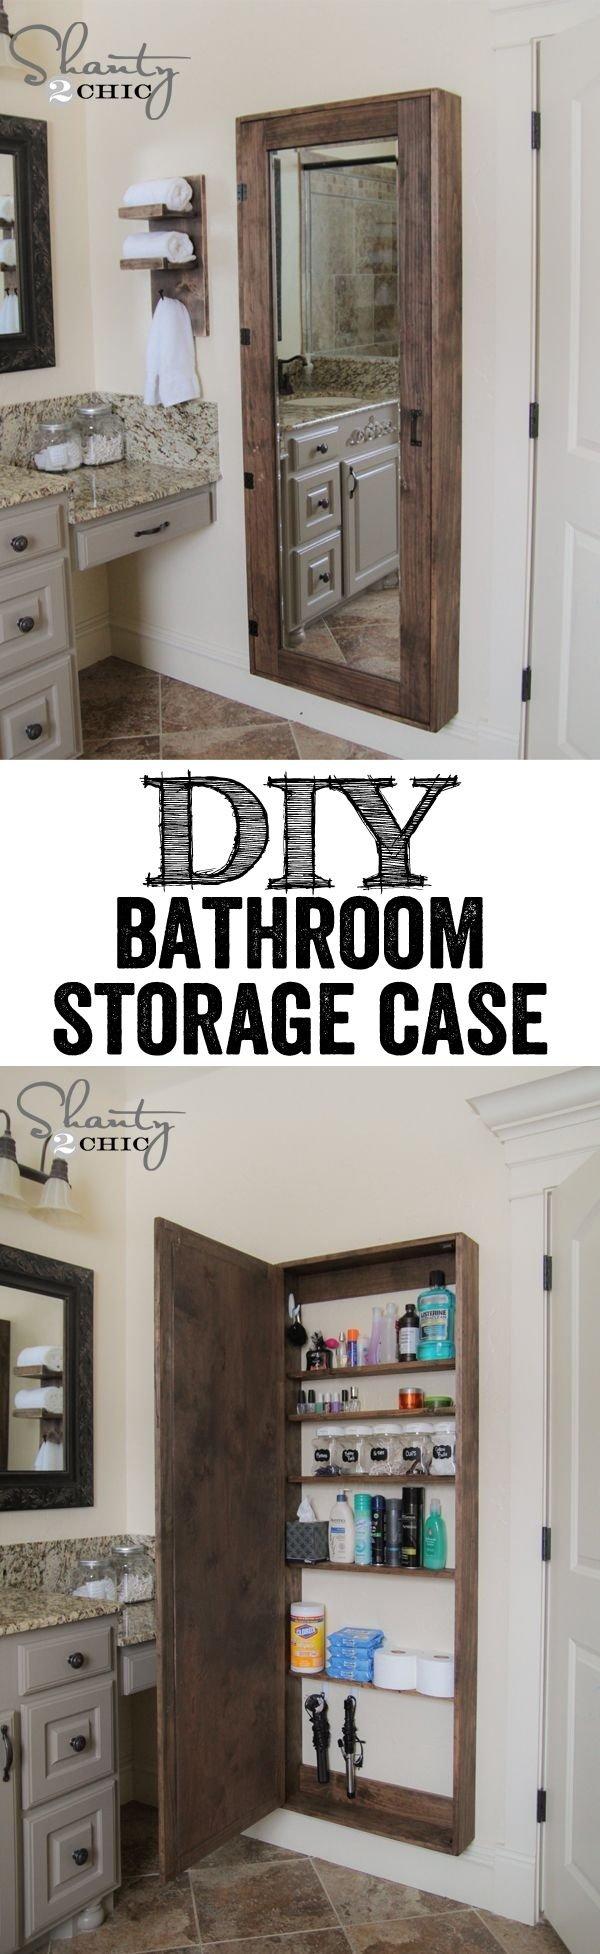 10 Awesome Pinterest Diy Home Decor Ideas 282 best pinterest diy home improvements images on pinterest good 2020